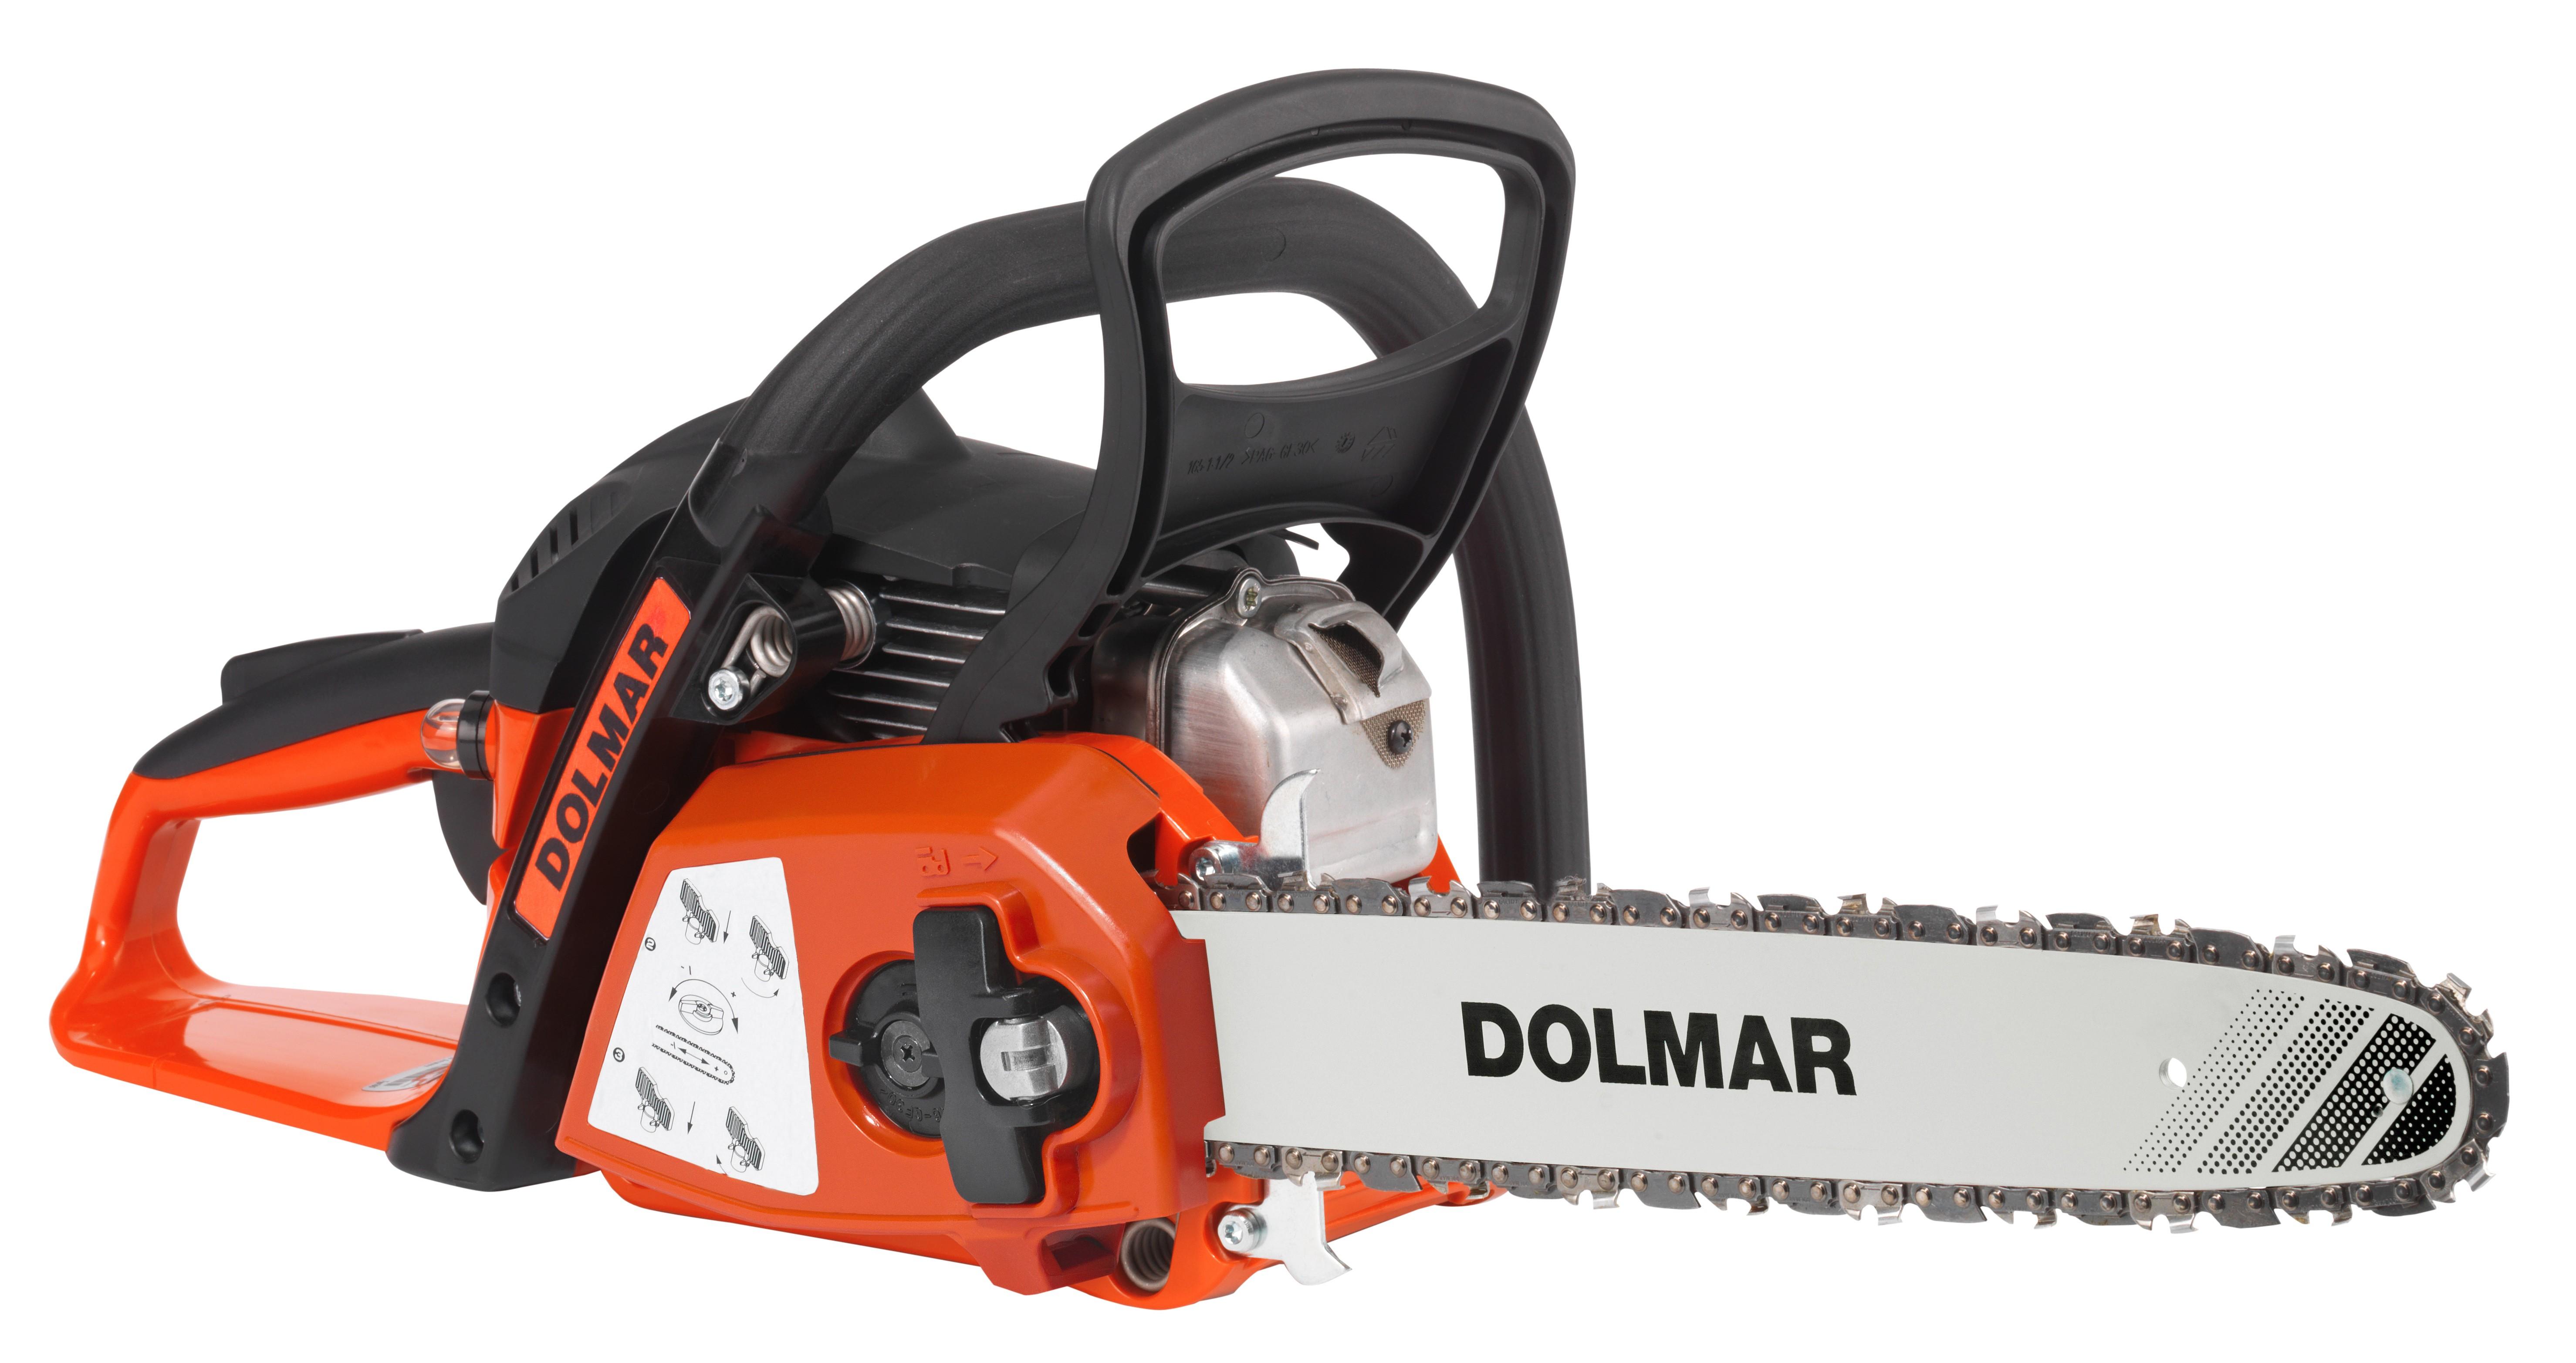 Benzin Kettensäge / Motorsäge Dolmar PS-32C TLC / 35 cm Bild 1